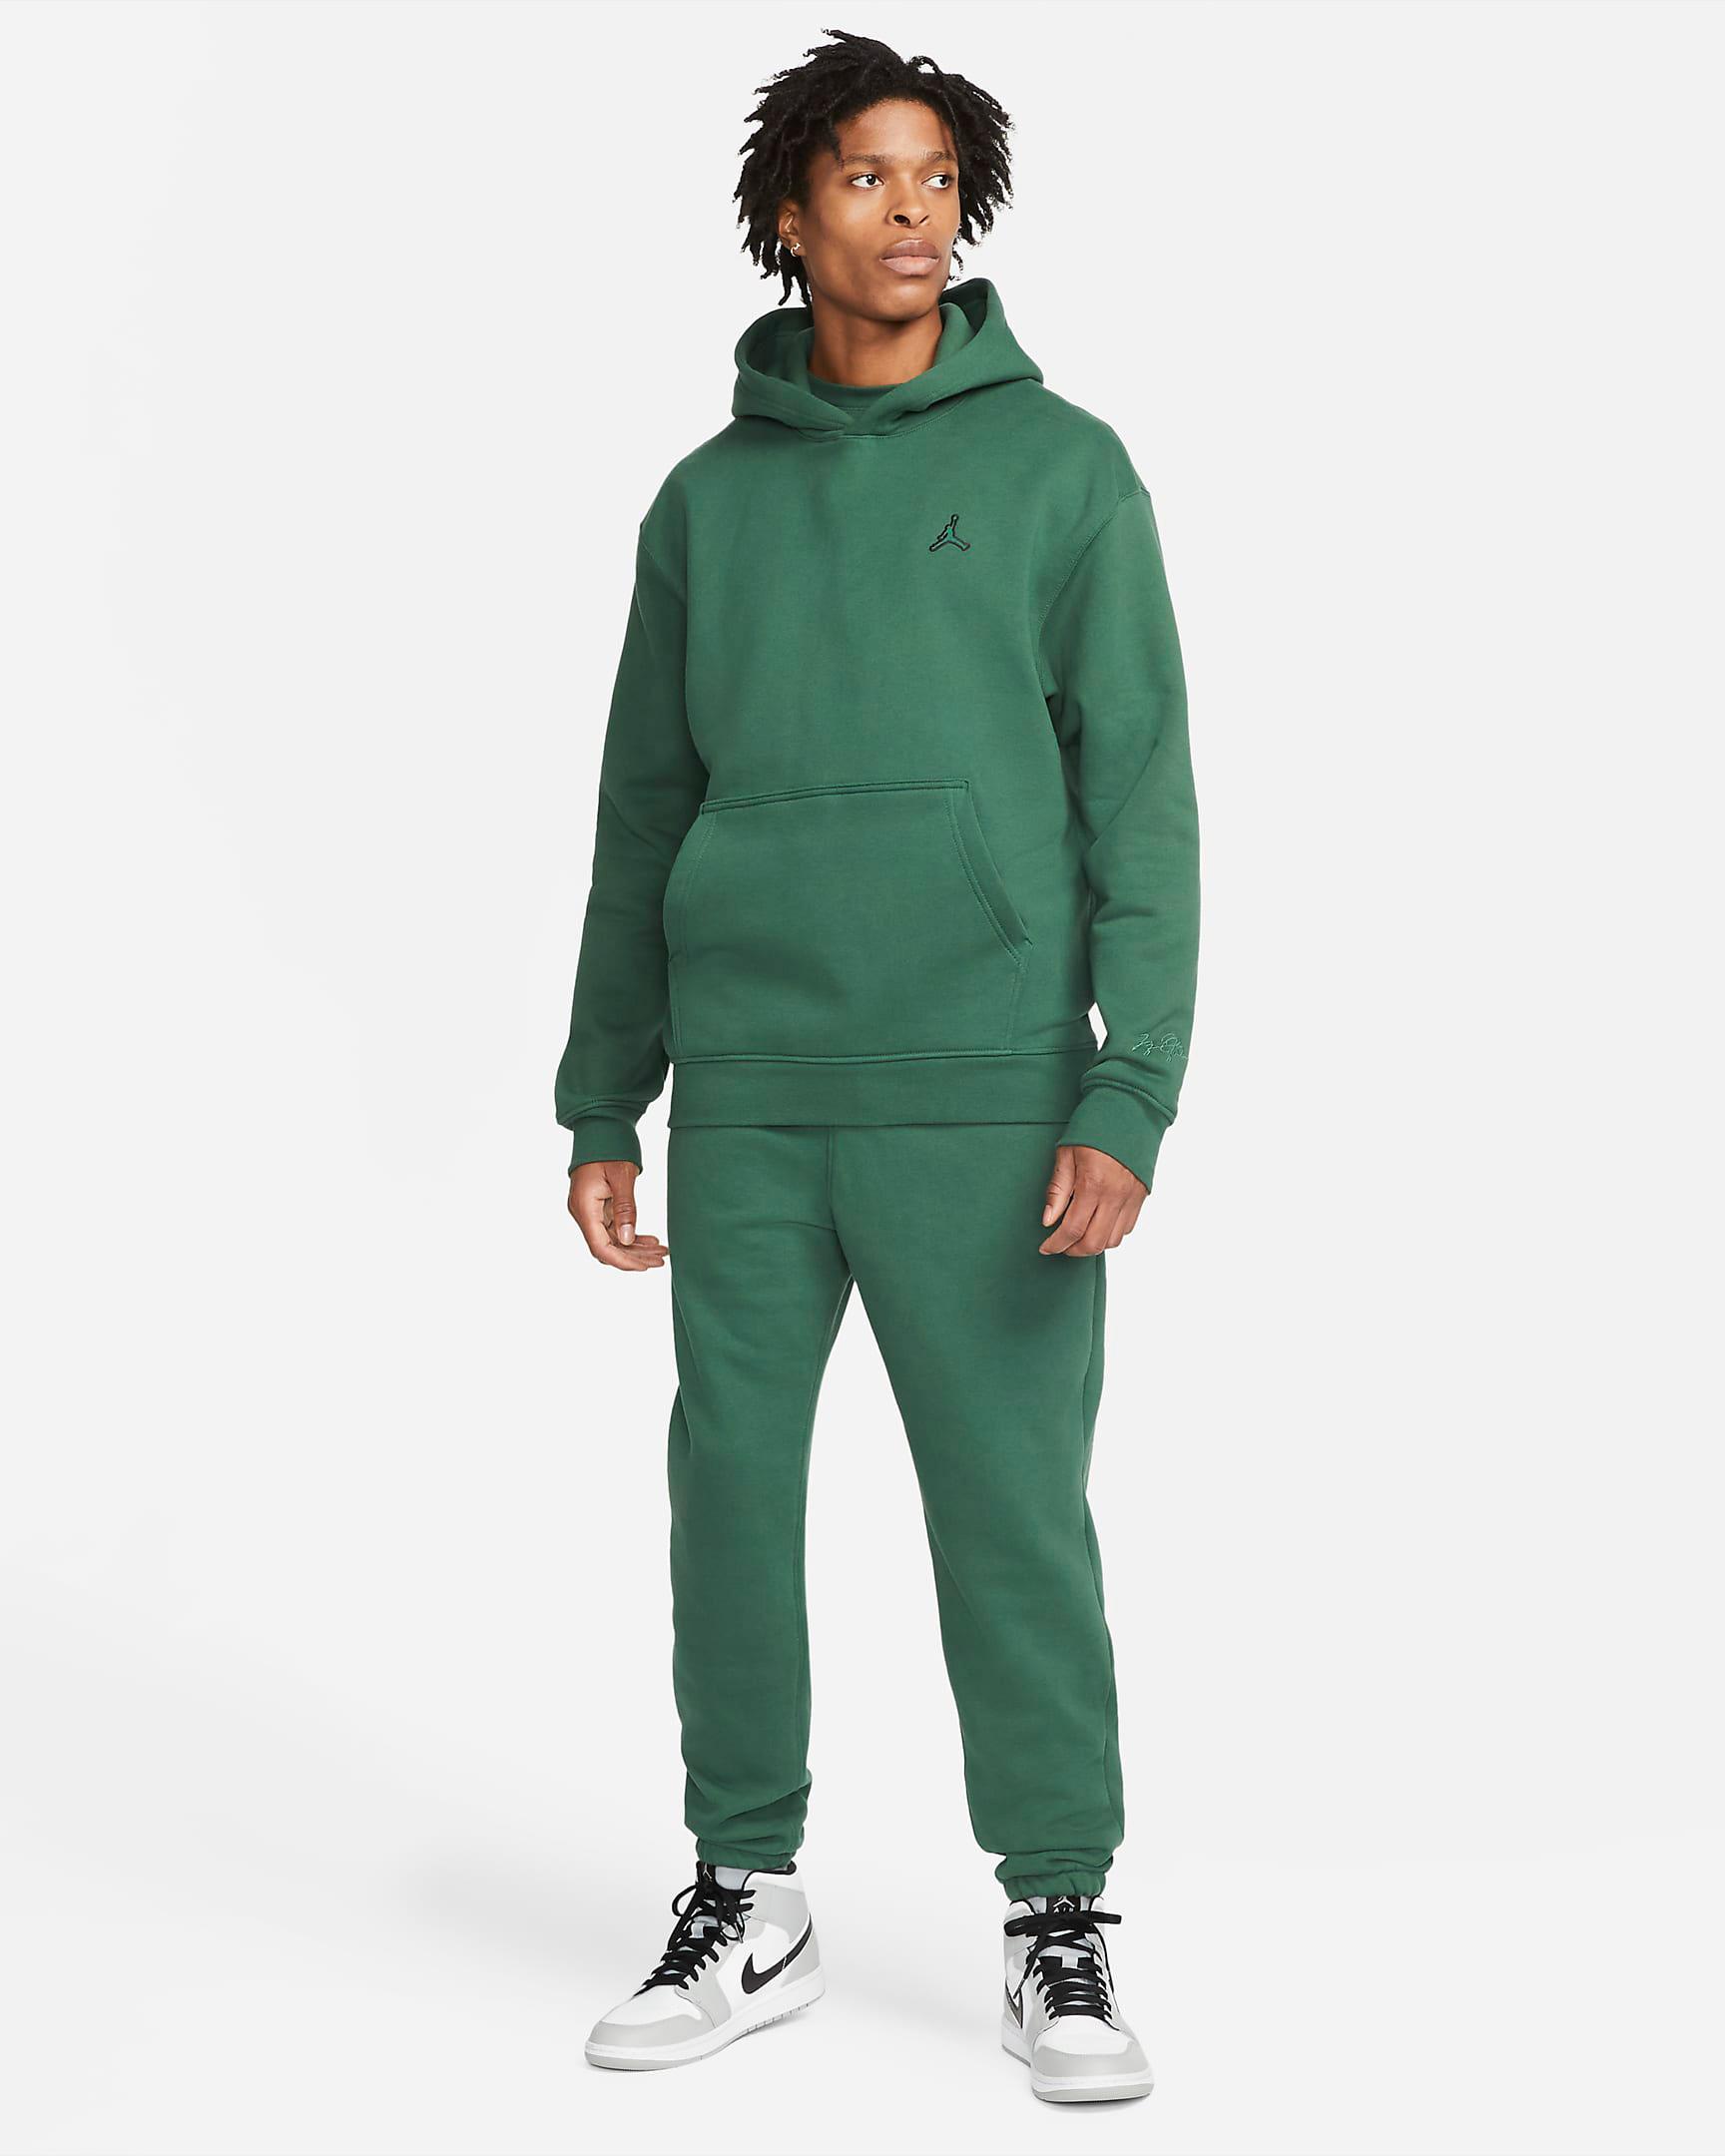 jordan-noble-green-essentials-pullover-hoodie-pants-outfit